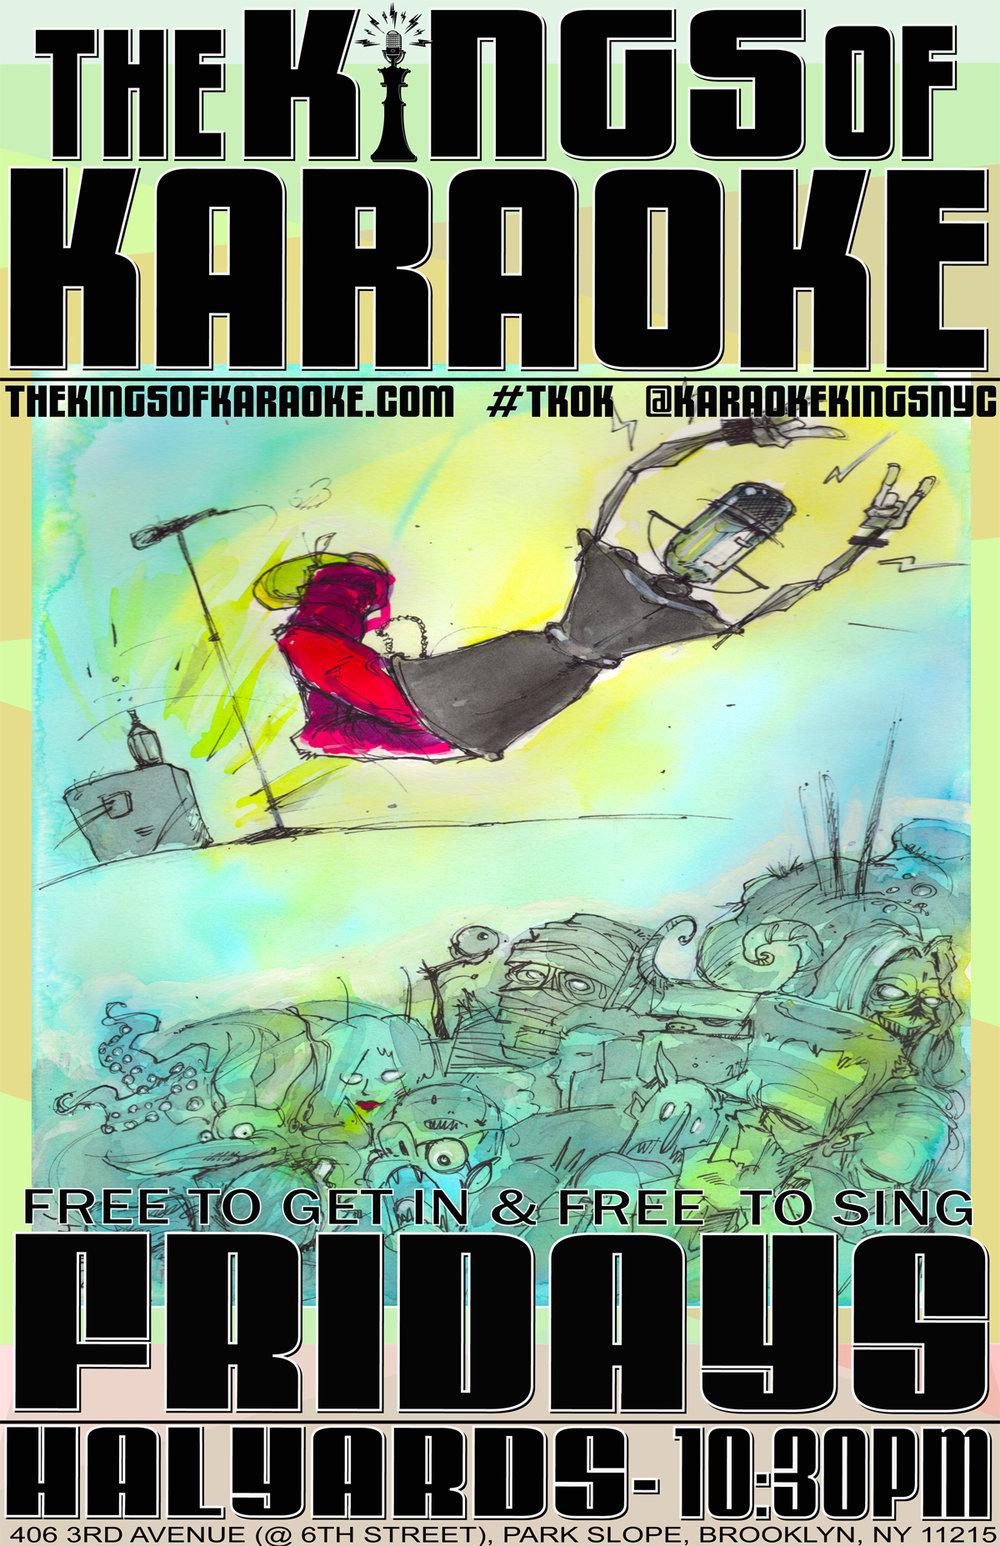 The Kings of Karaoke @ Halyards - Fridays -1030pm-230am- 4x6.jpg